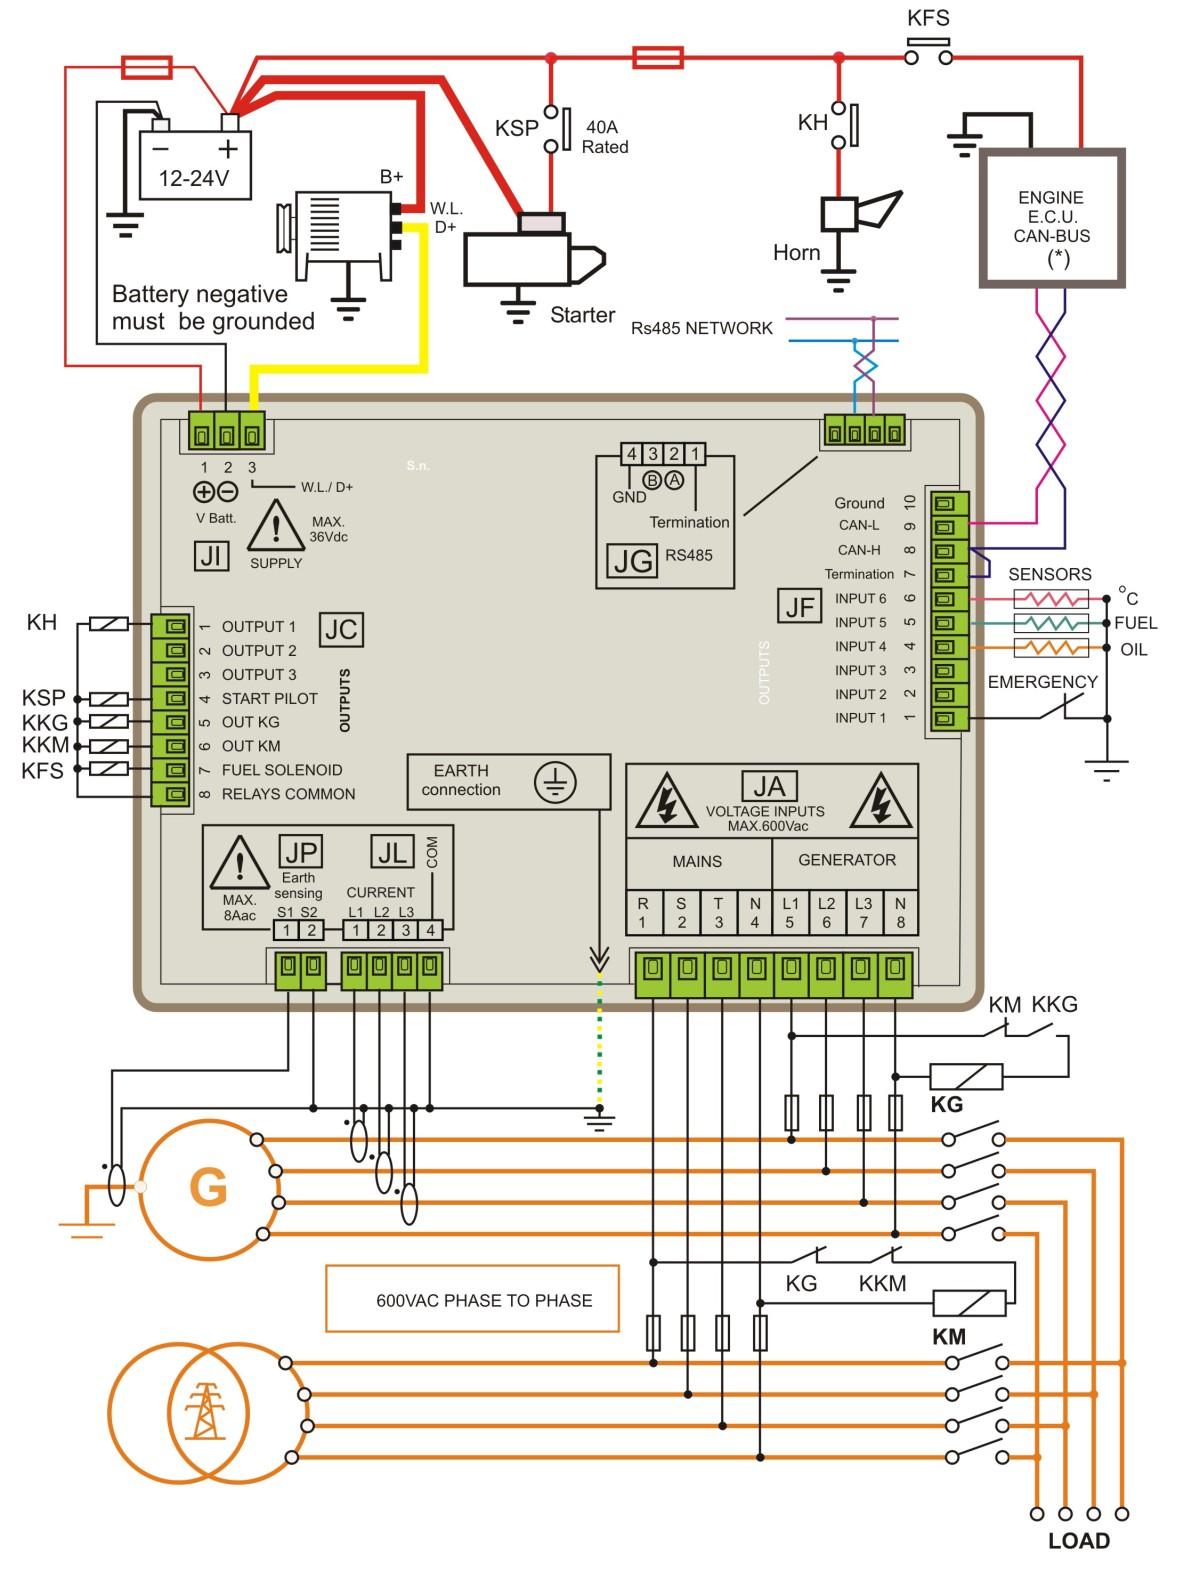 Wiring diagram model a ford the wiring diagram readingrat net on wiring diagram vespa excel 1964 Honda 50 Wiring Diagrams Vespa Stator Diagram